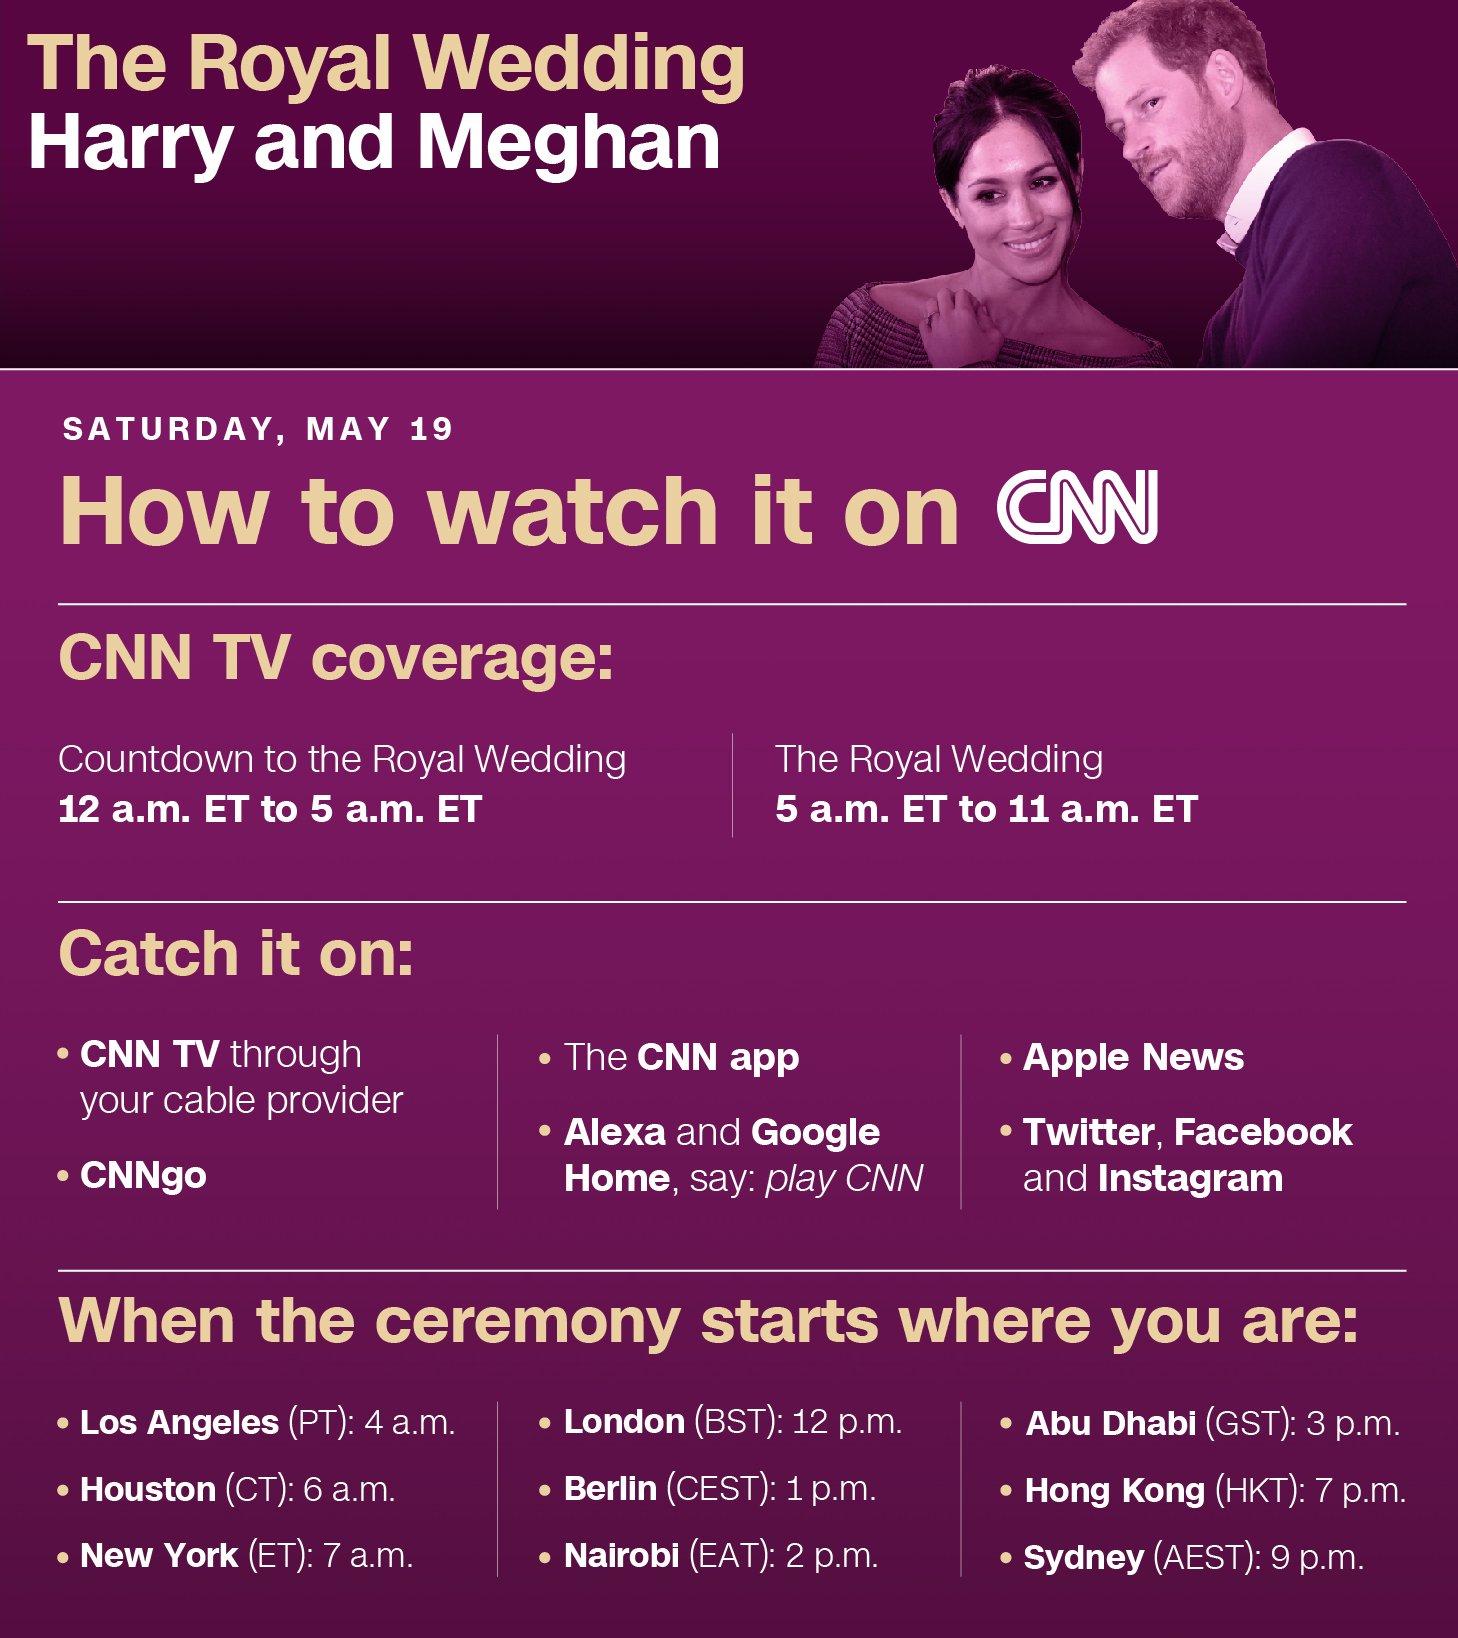 How to watch the #royalwedding https://t.co/7Oh6hqLHOc https://t.co/kSe8WhgXS3